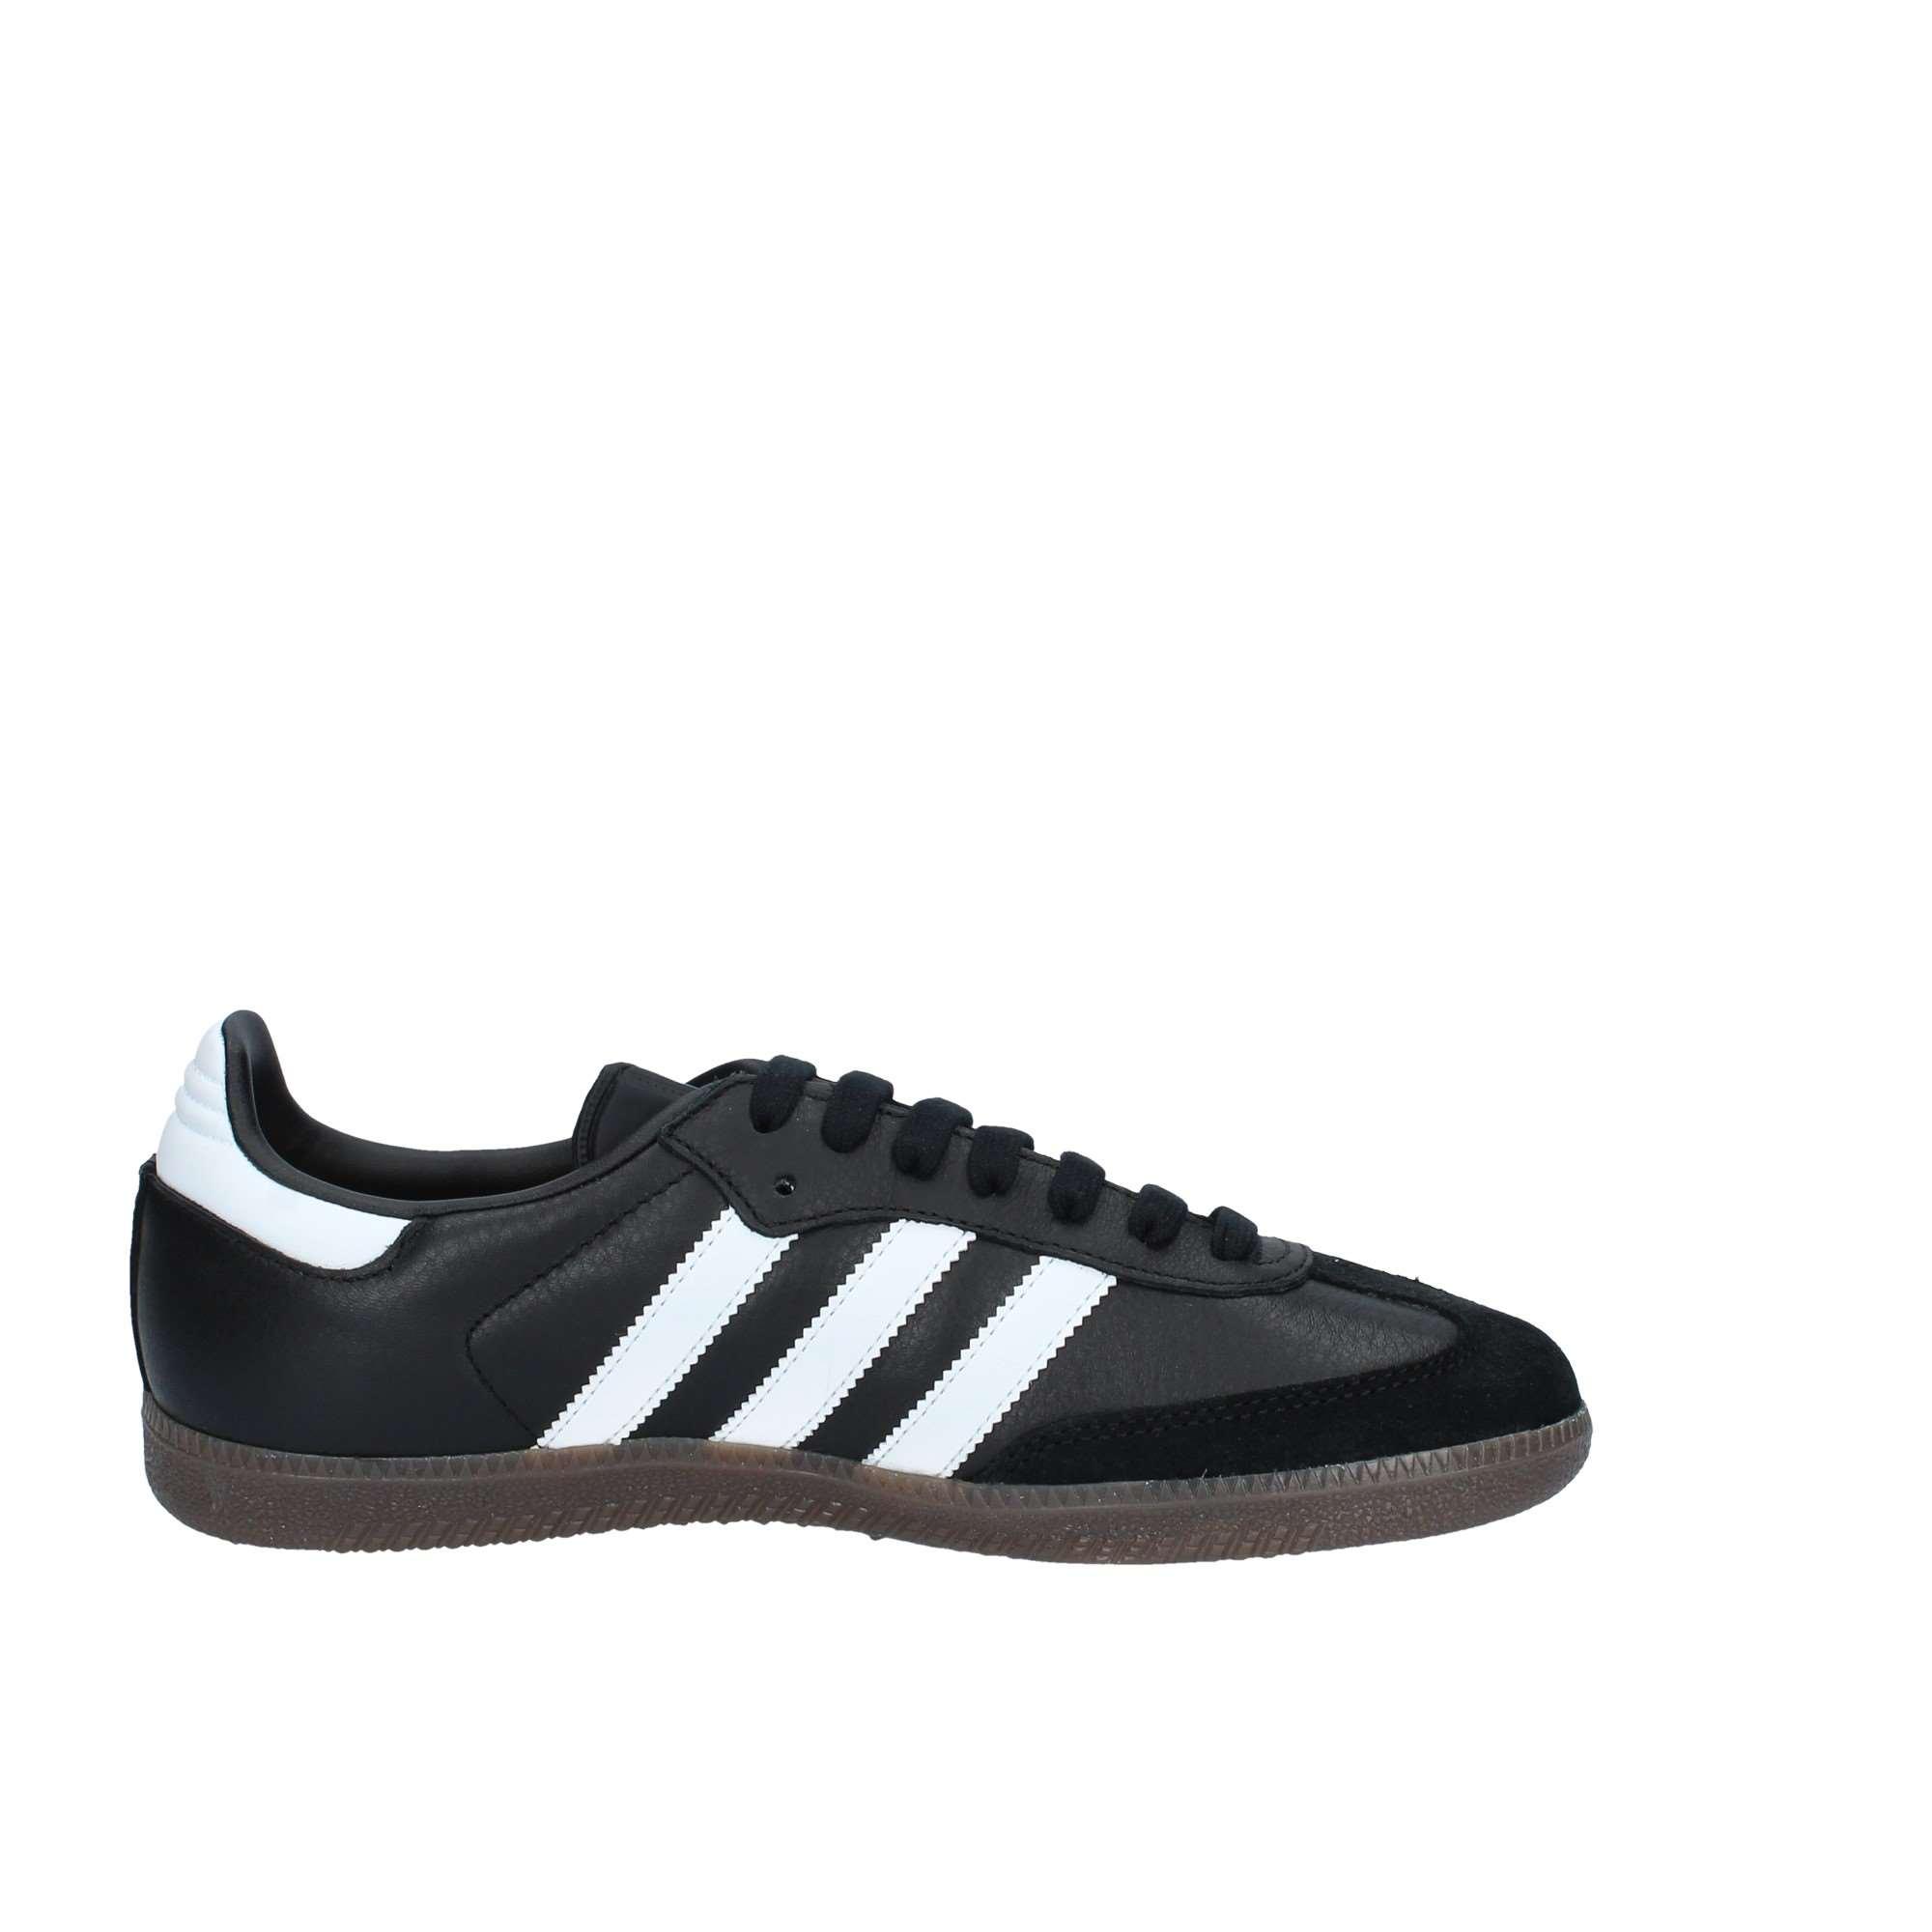 Adidas Samba OG Scarpe da ginnastica Basse Unisex adulto Nero (core Blackfoot